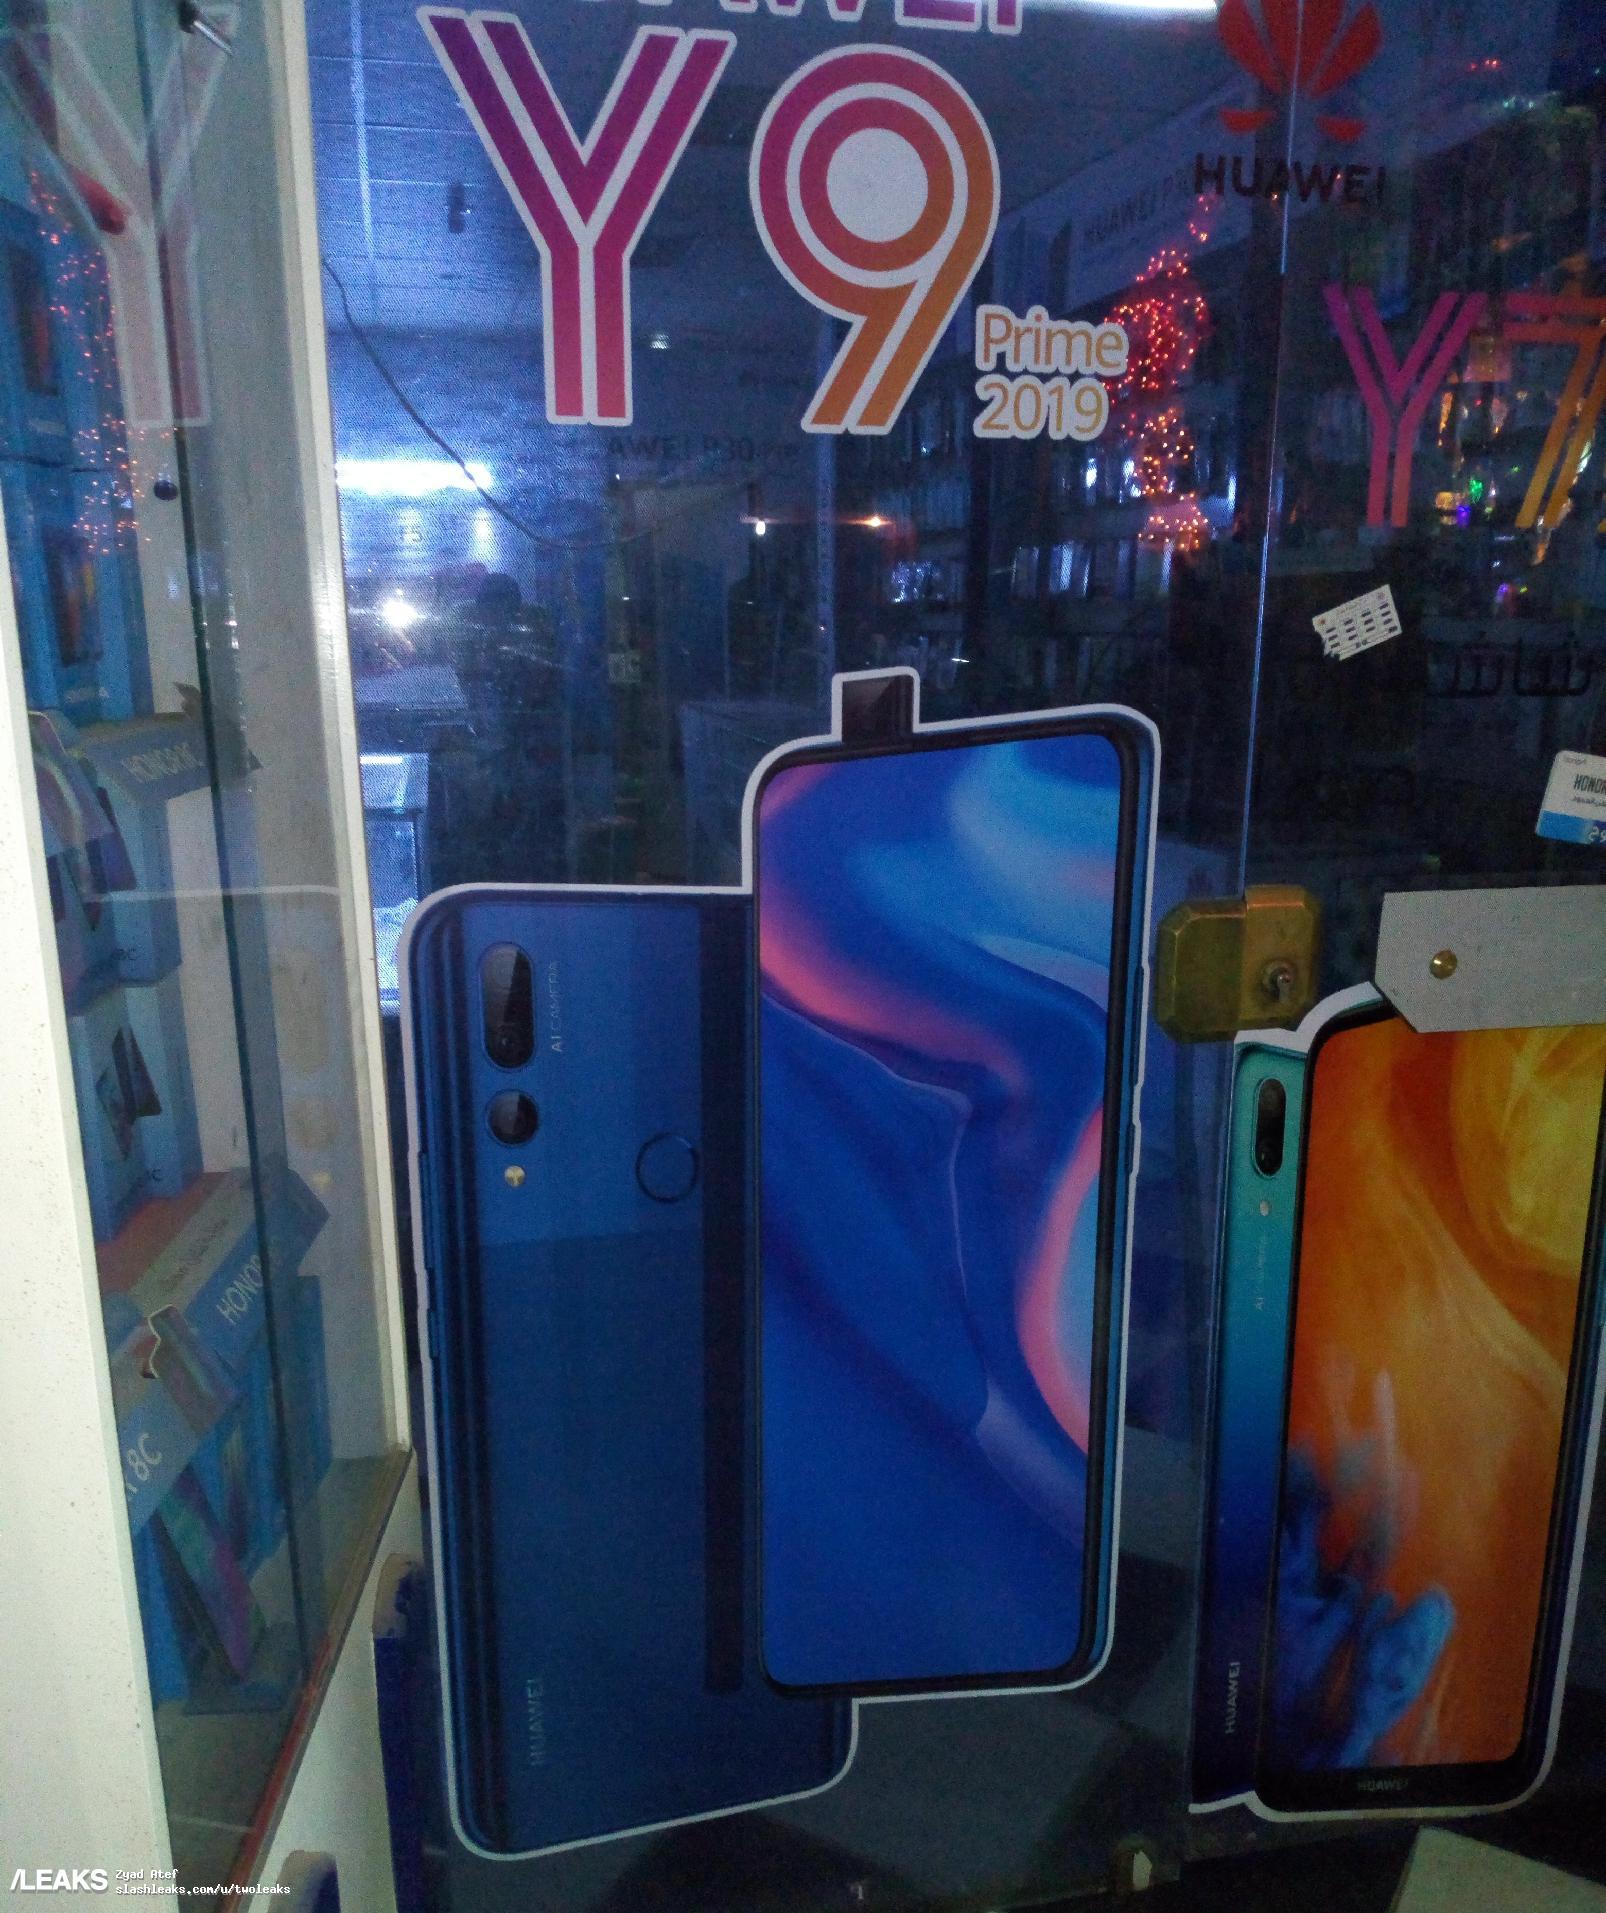 Huawei Y9 Prime 2019 Poster